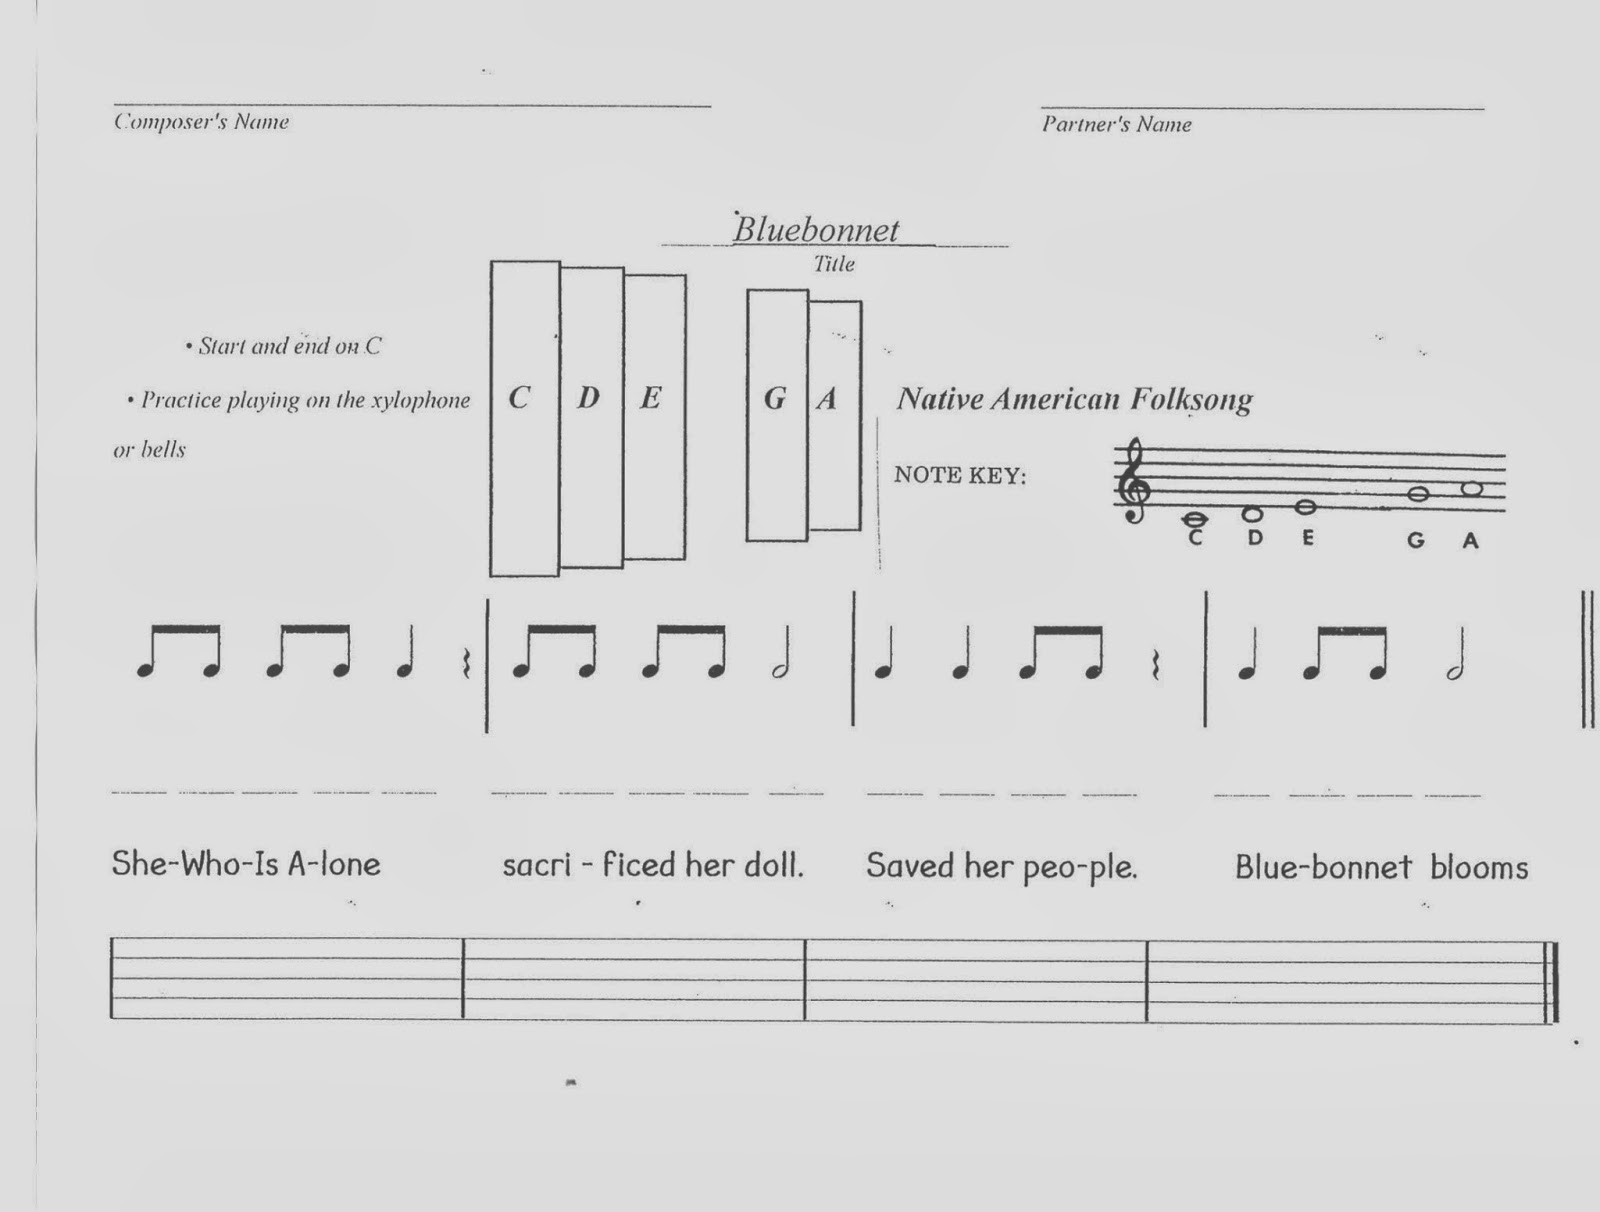 Nhcs Music Education November